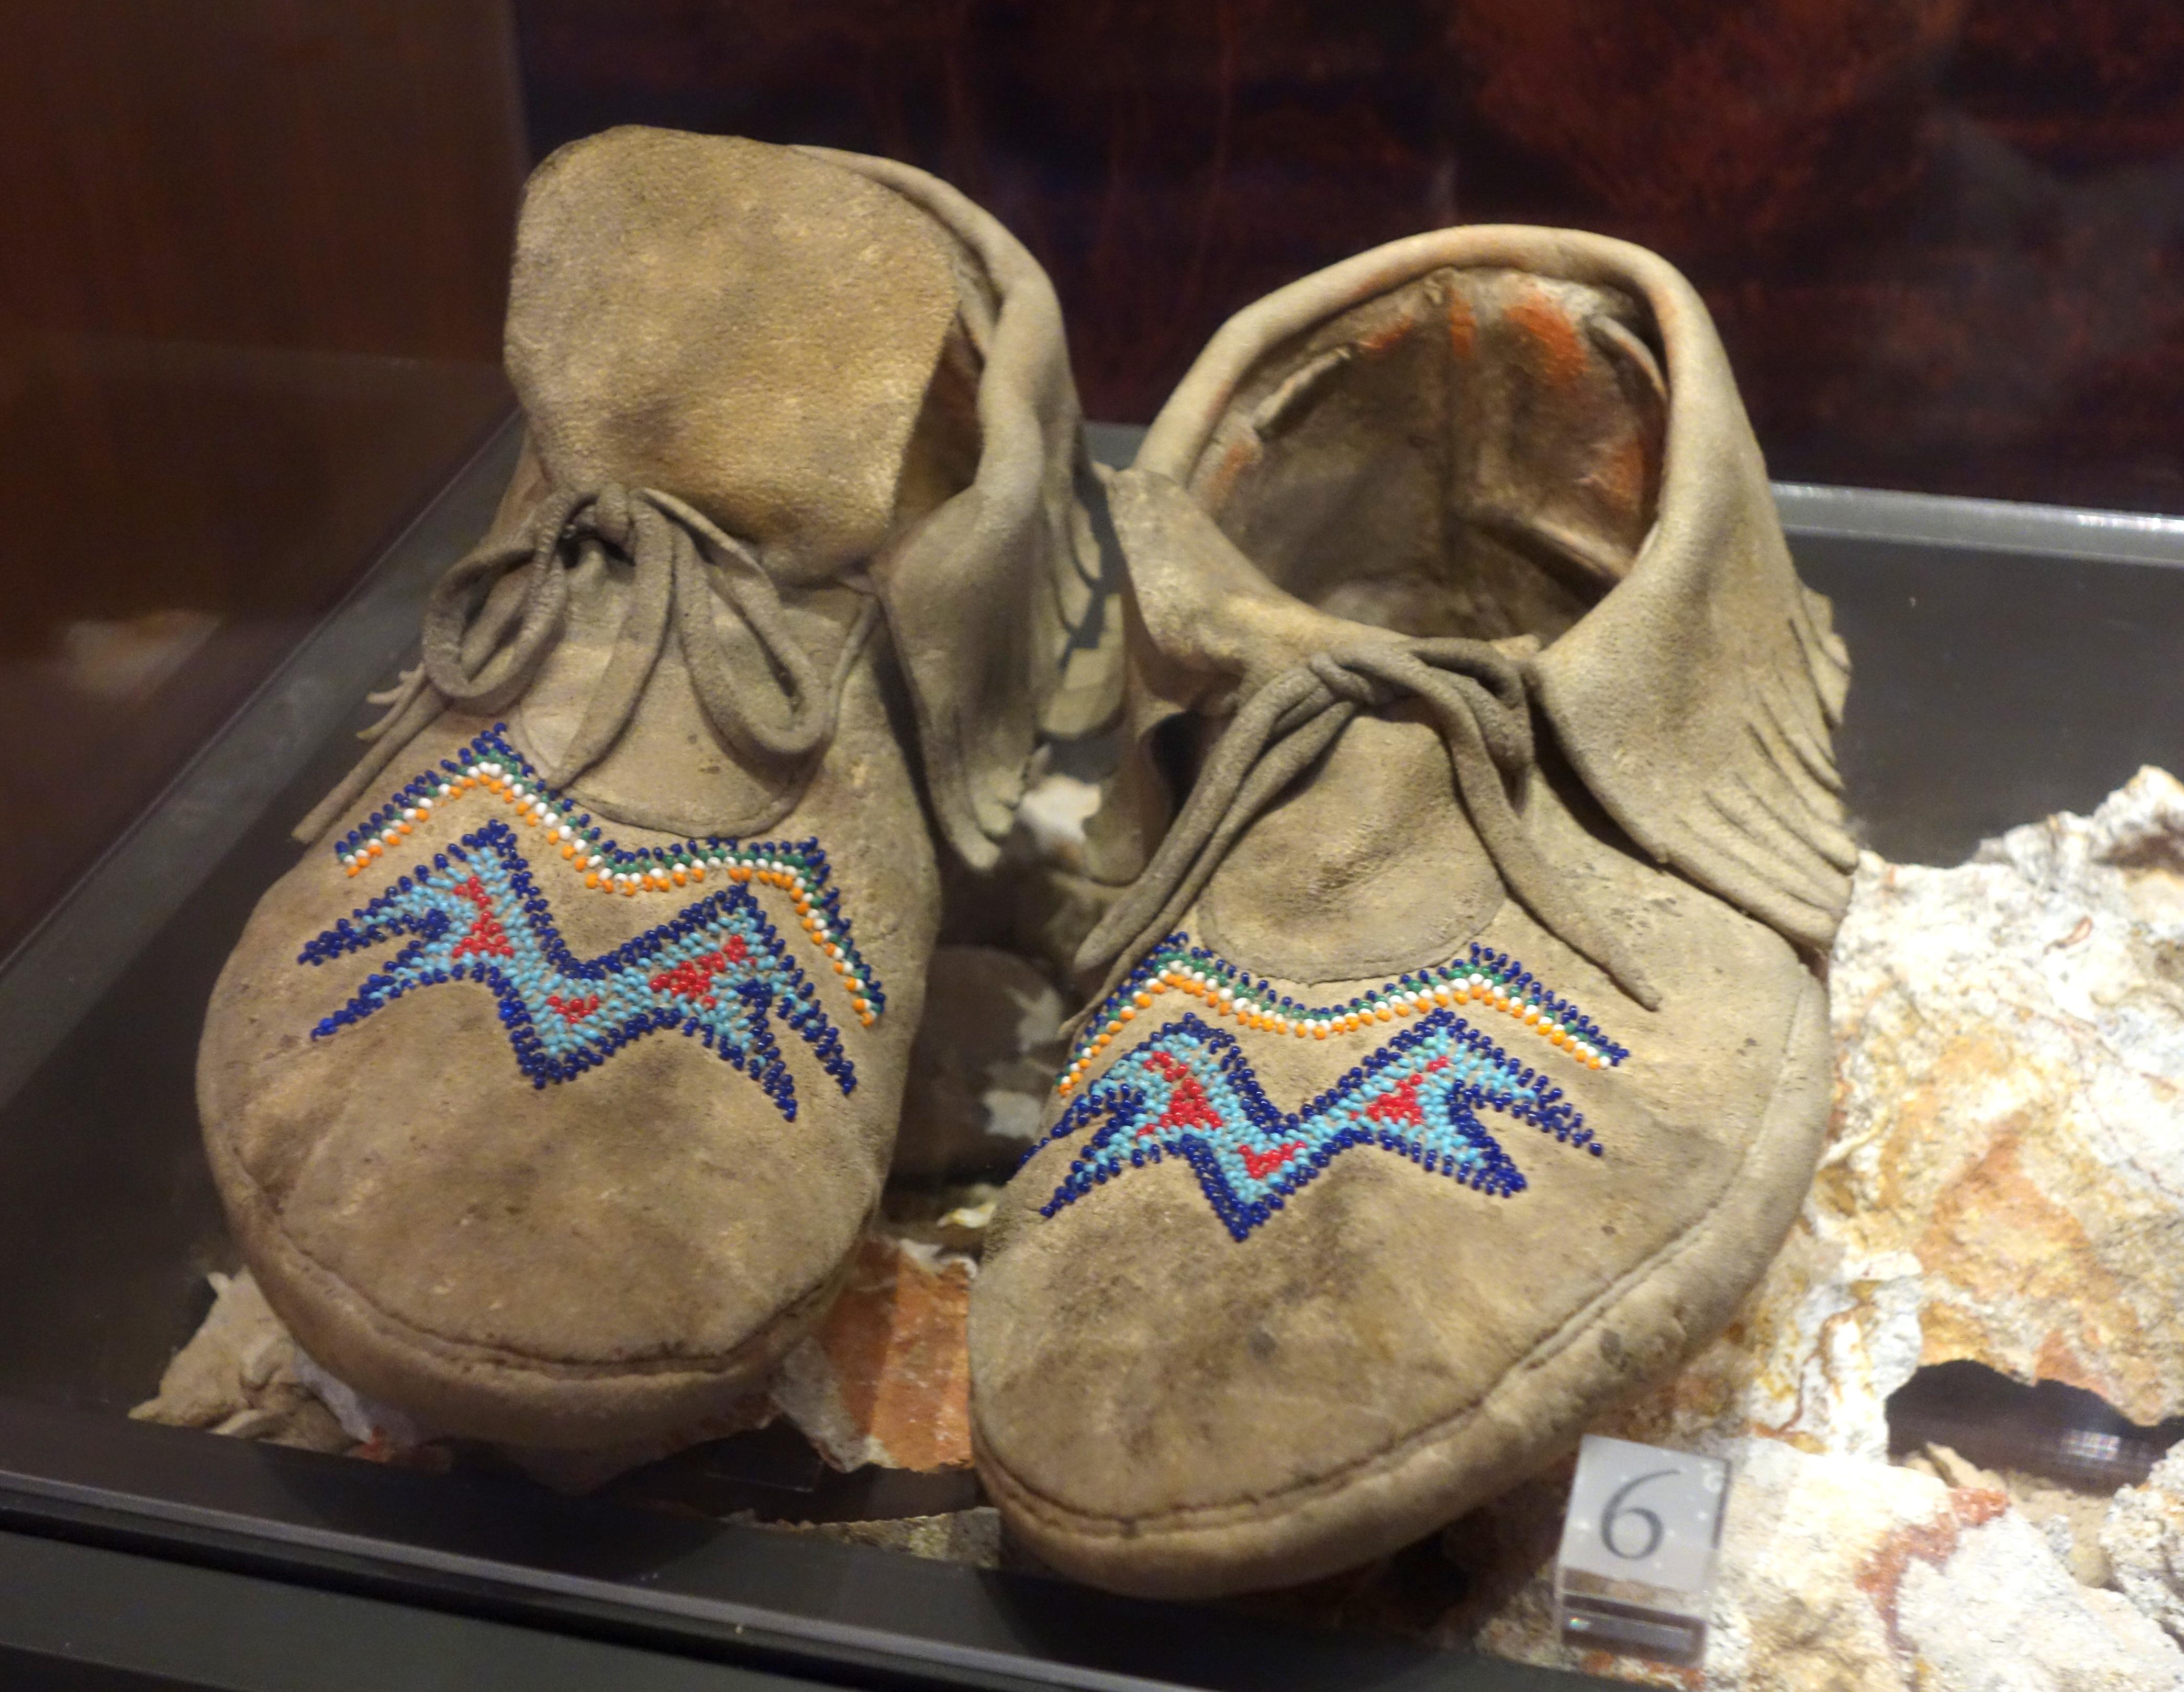 The Bata Shoe Museum Review